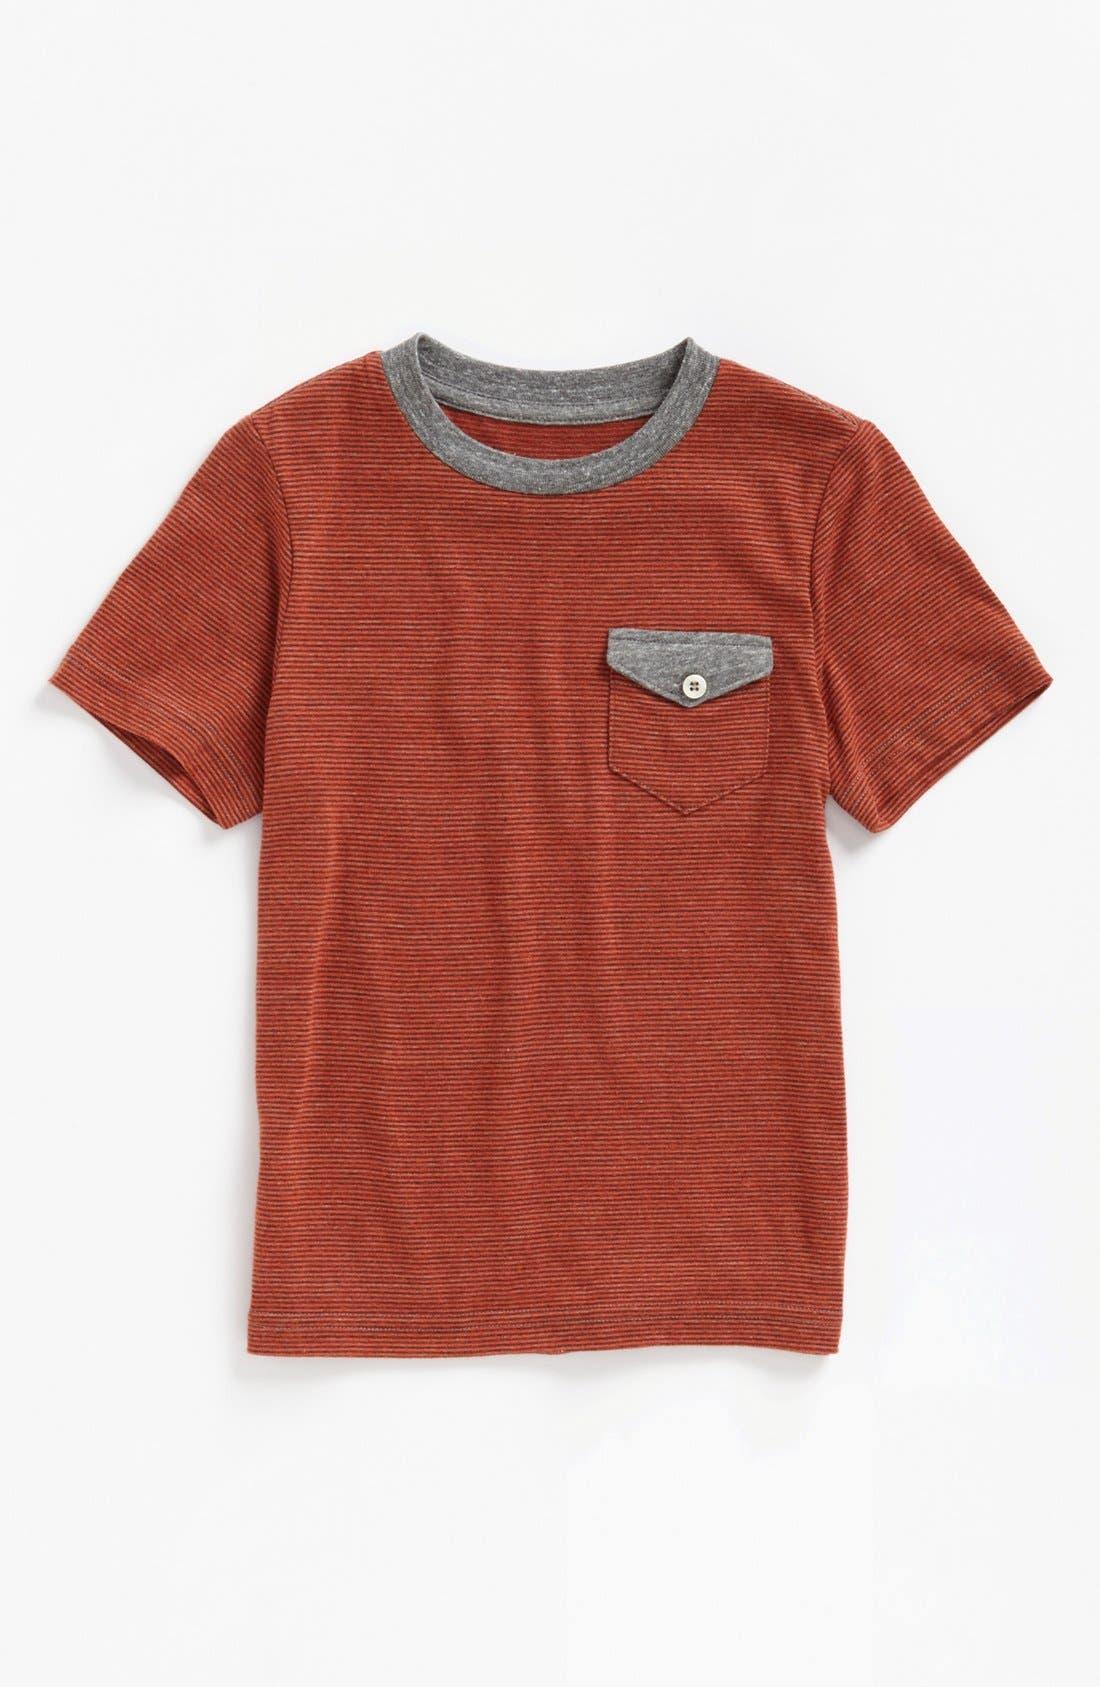 Main Image - Tucker + Tate 'Bretland' T-Shirt (Big Boys)